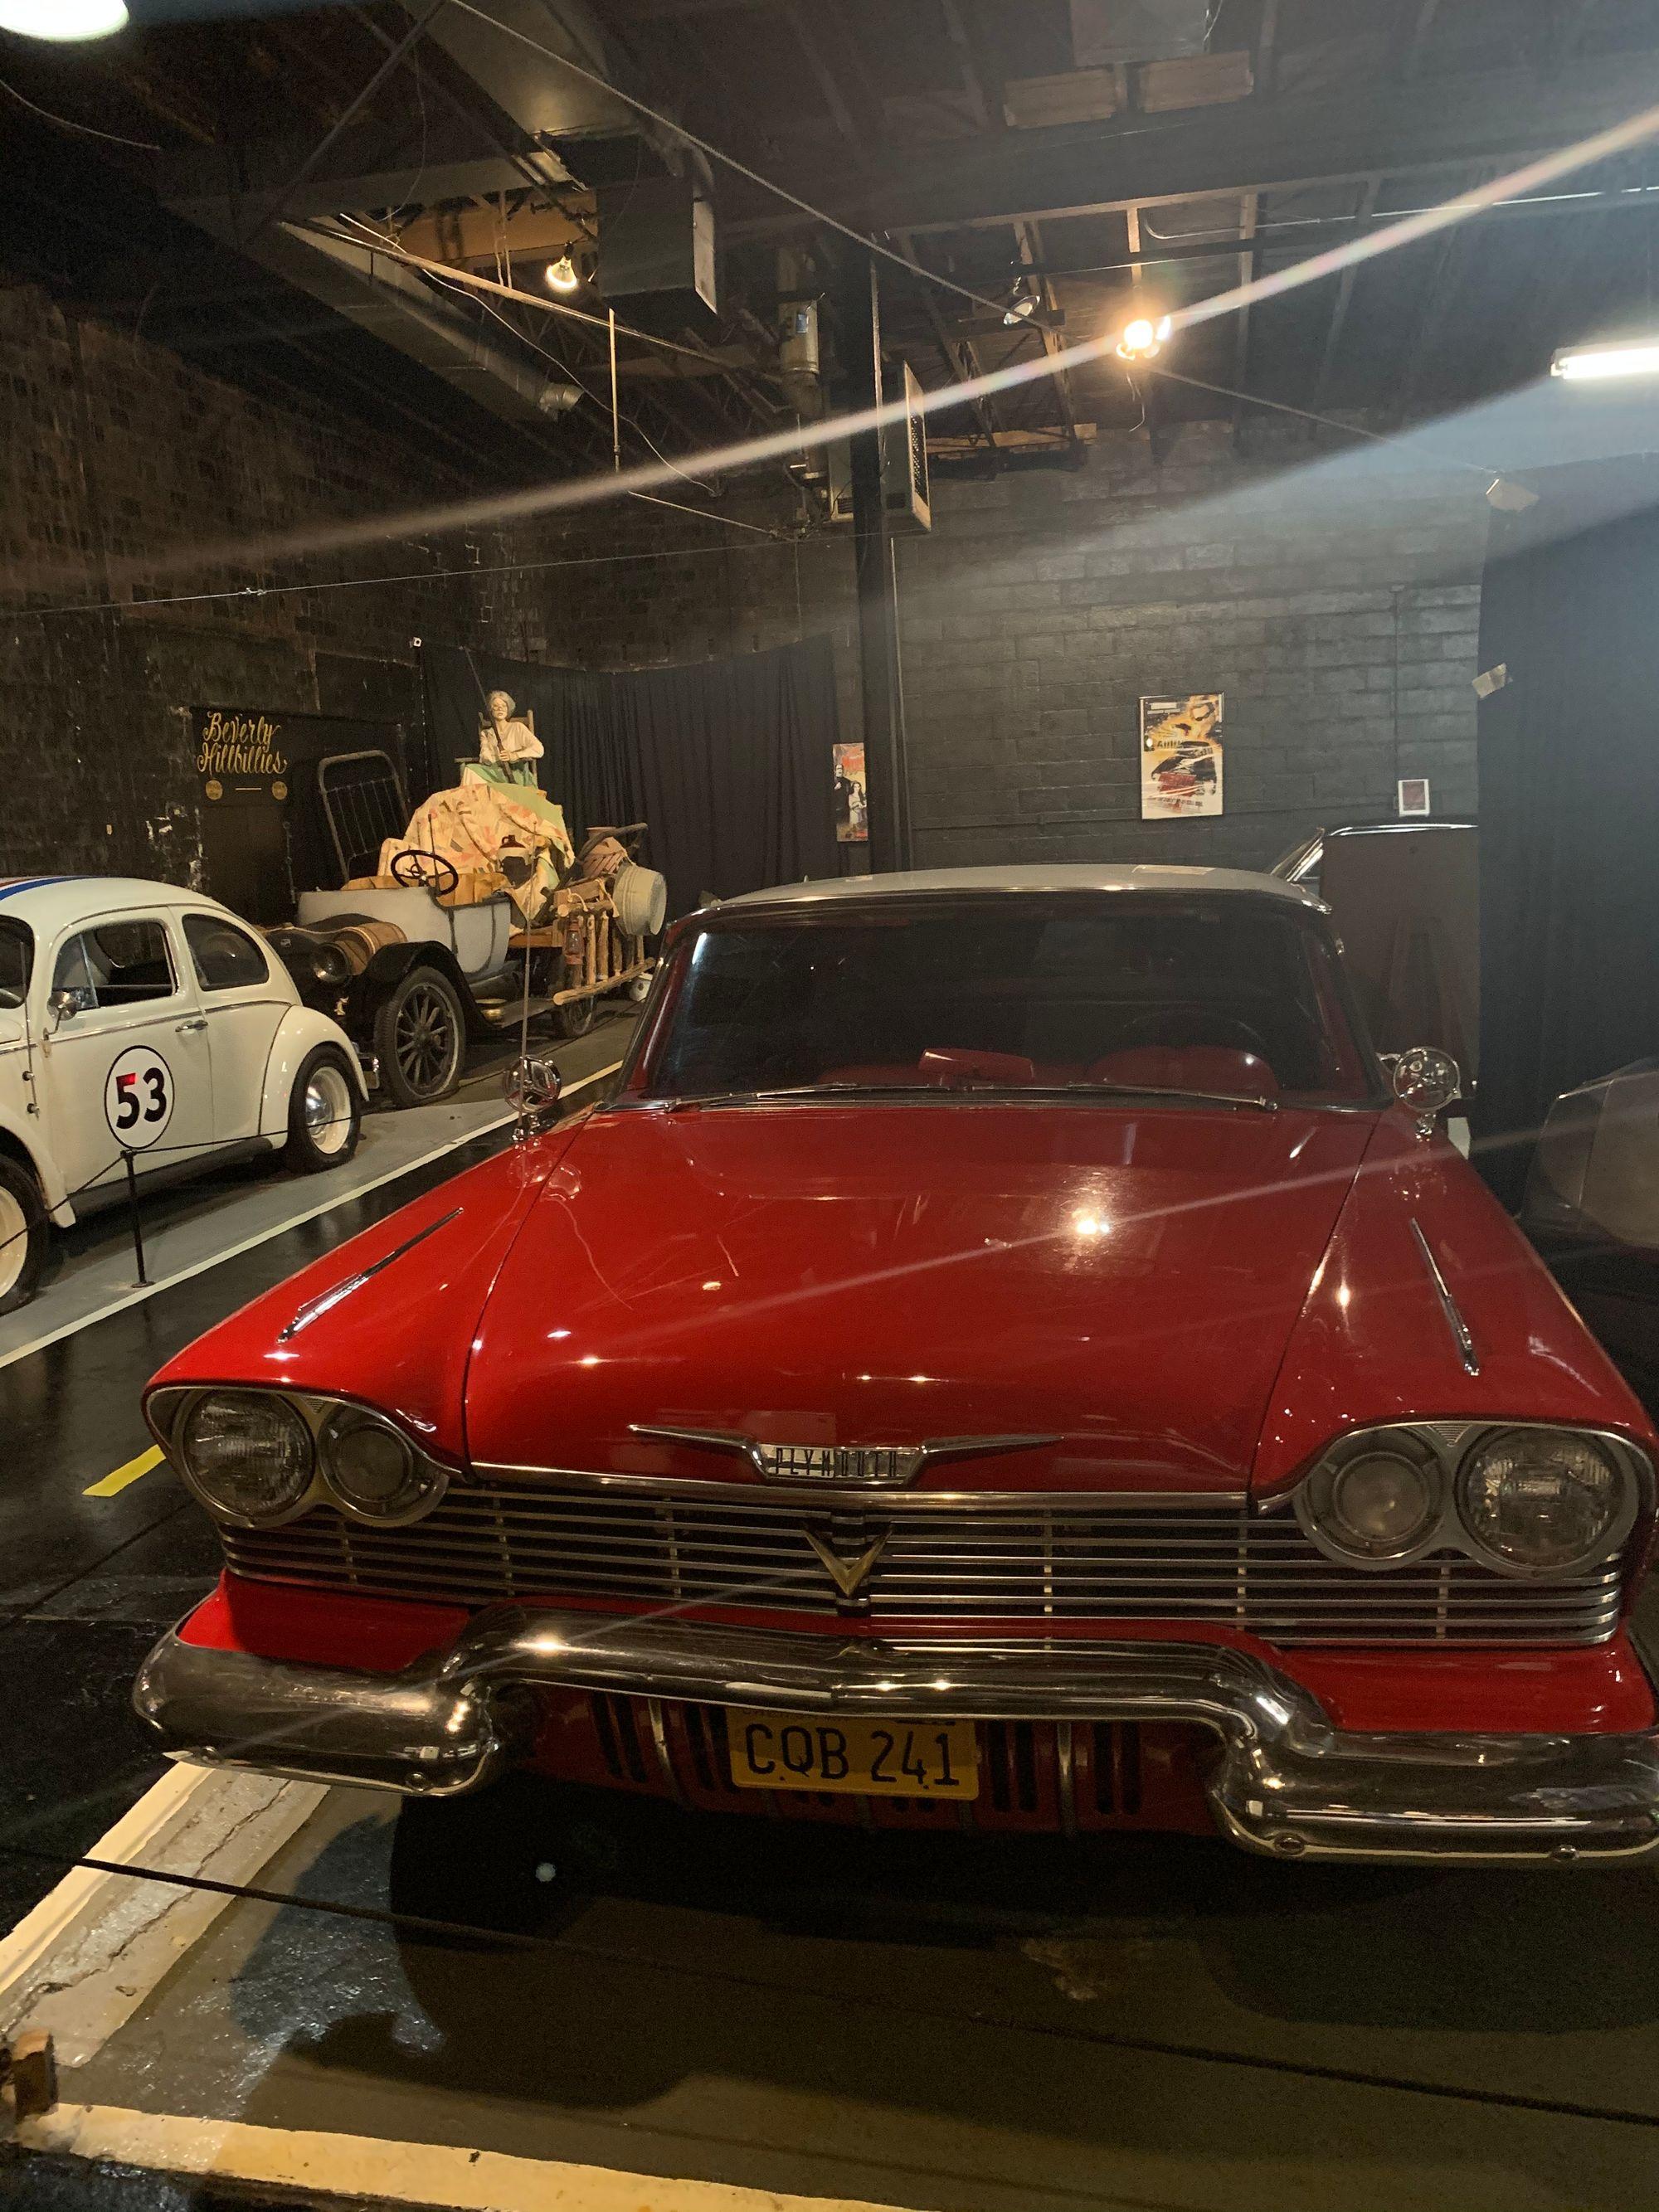 "<img src=""christine.jpg"" alt=""Christine the 1958 Plymouth Fury"">"